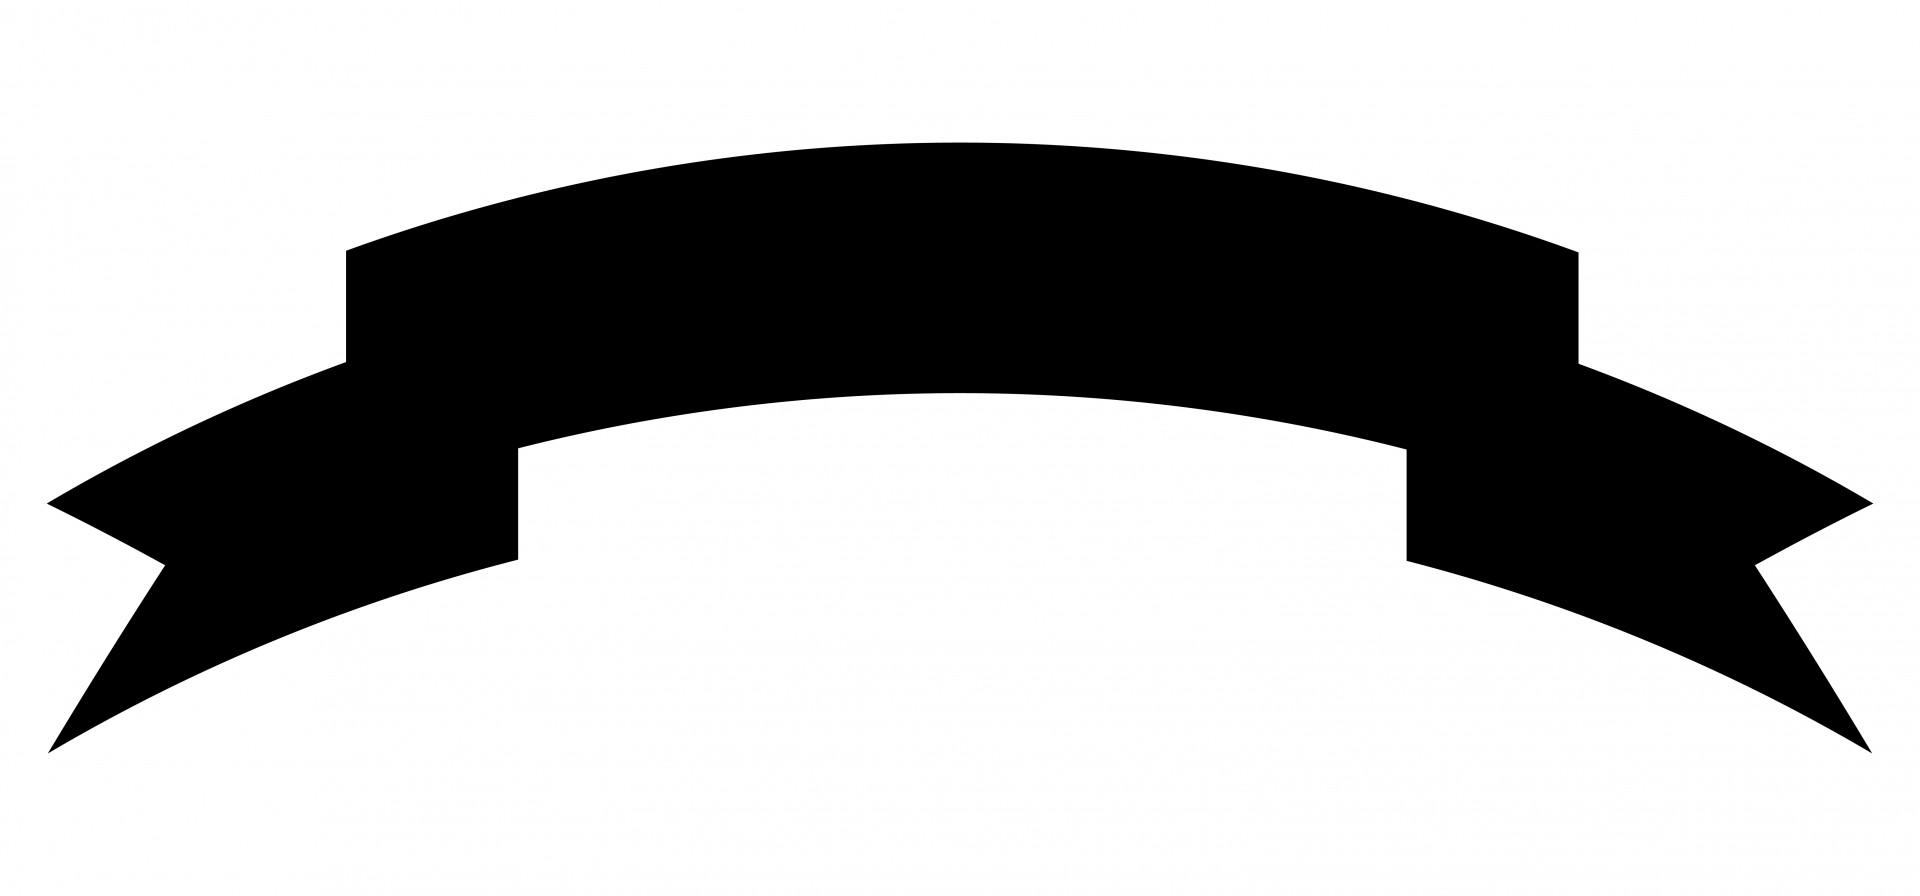 Black banner clipart 2 » Clipart Station.